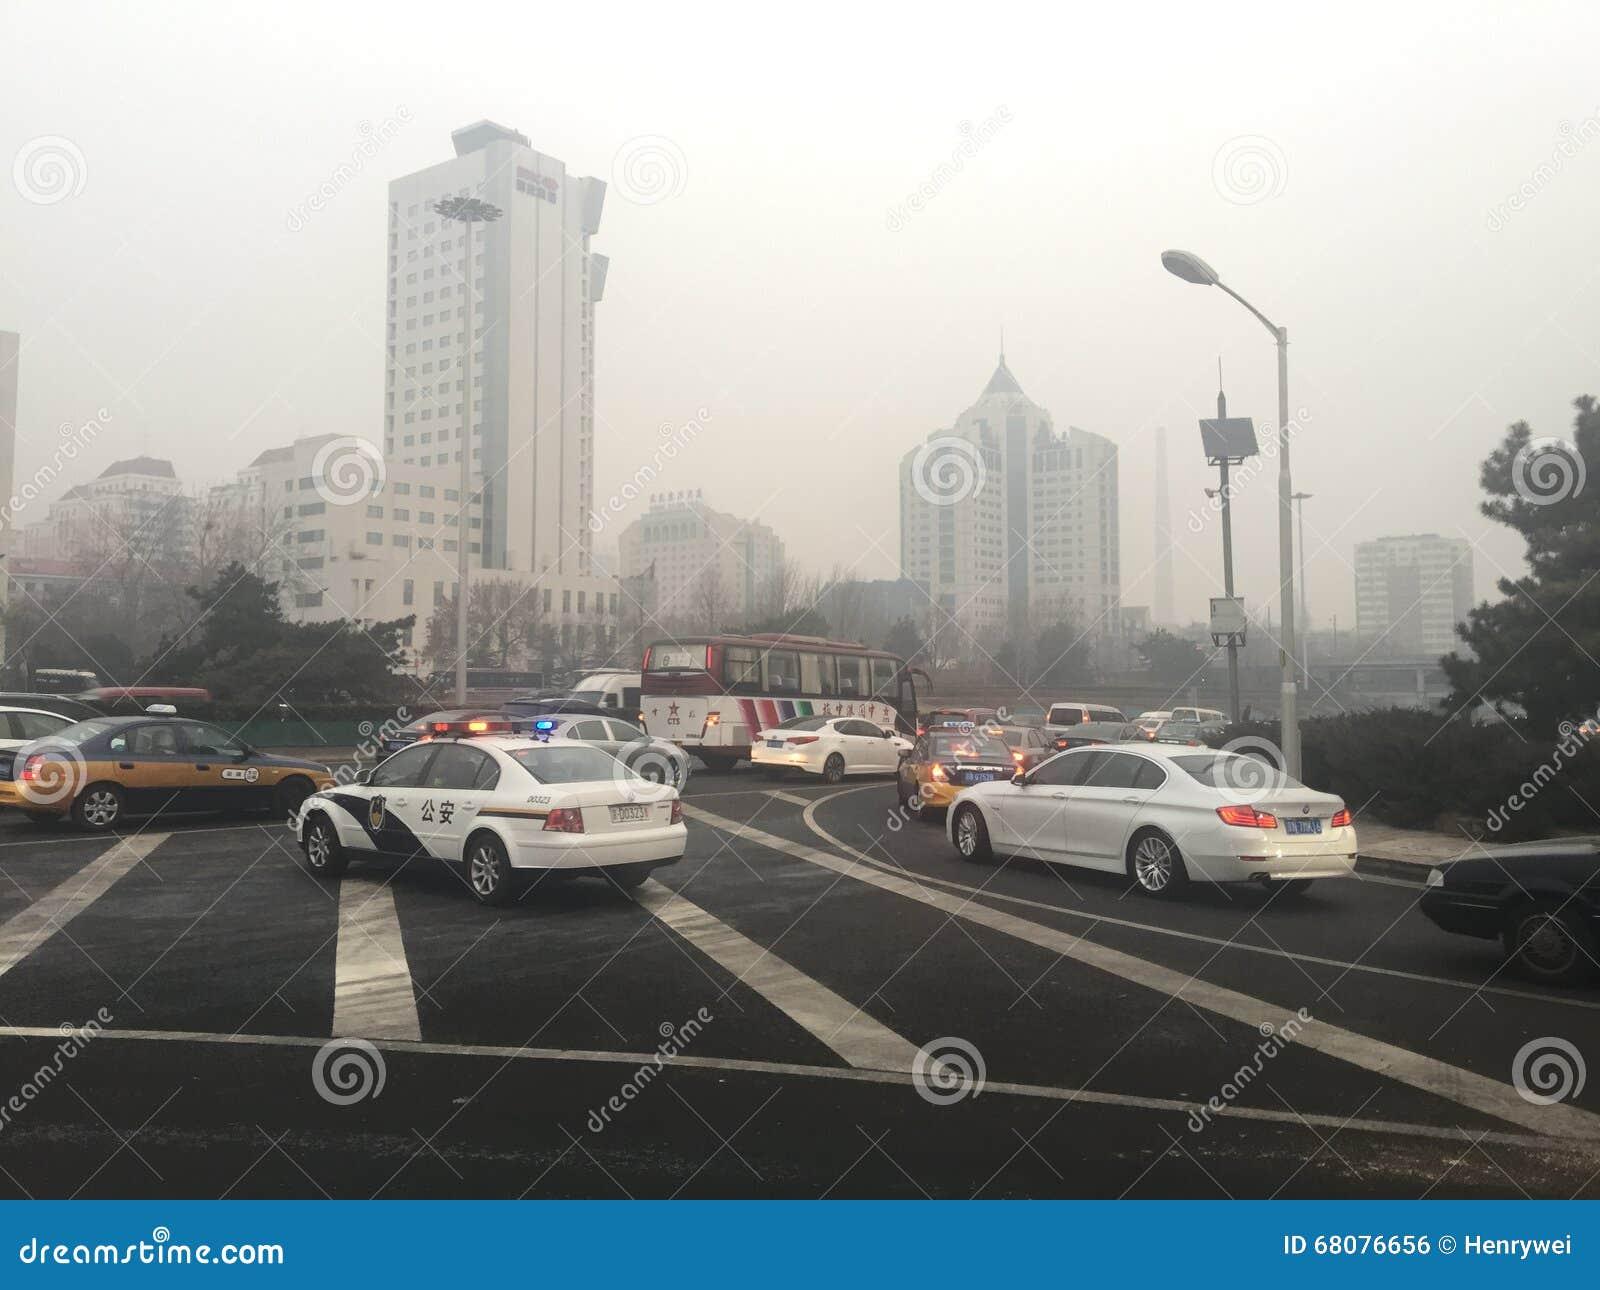 Stau und Dunst starken Verkehrs Pekings